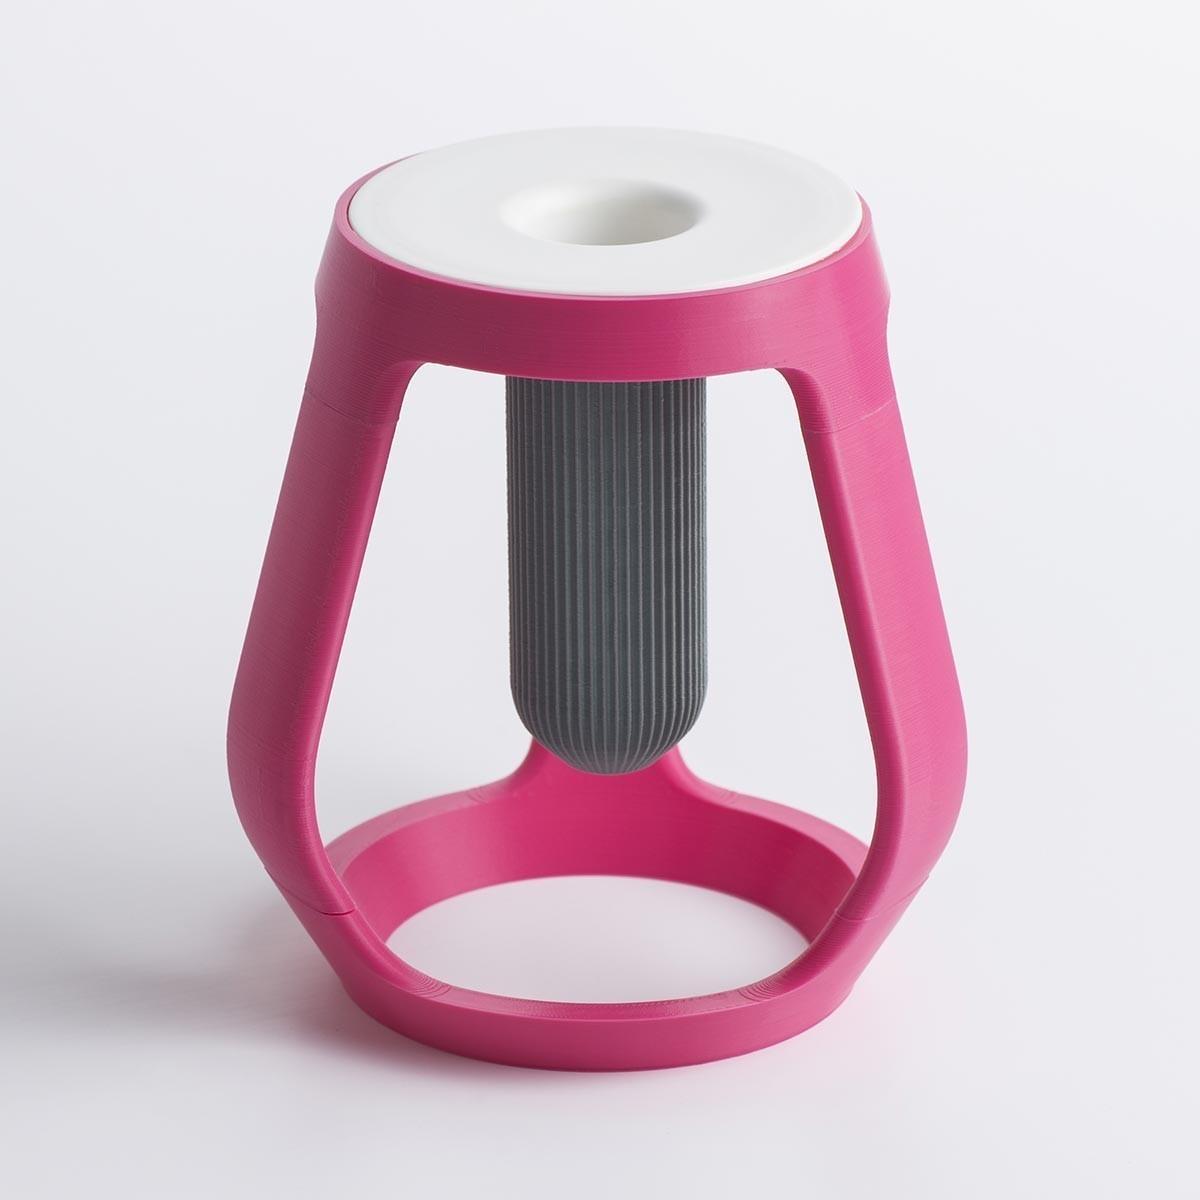 gravity_04.jpg Download free STL file Gravity - Flower vase • 3D printing object, EUMAKERS